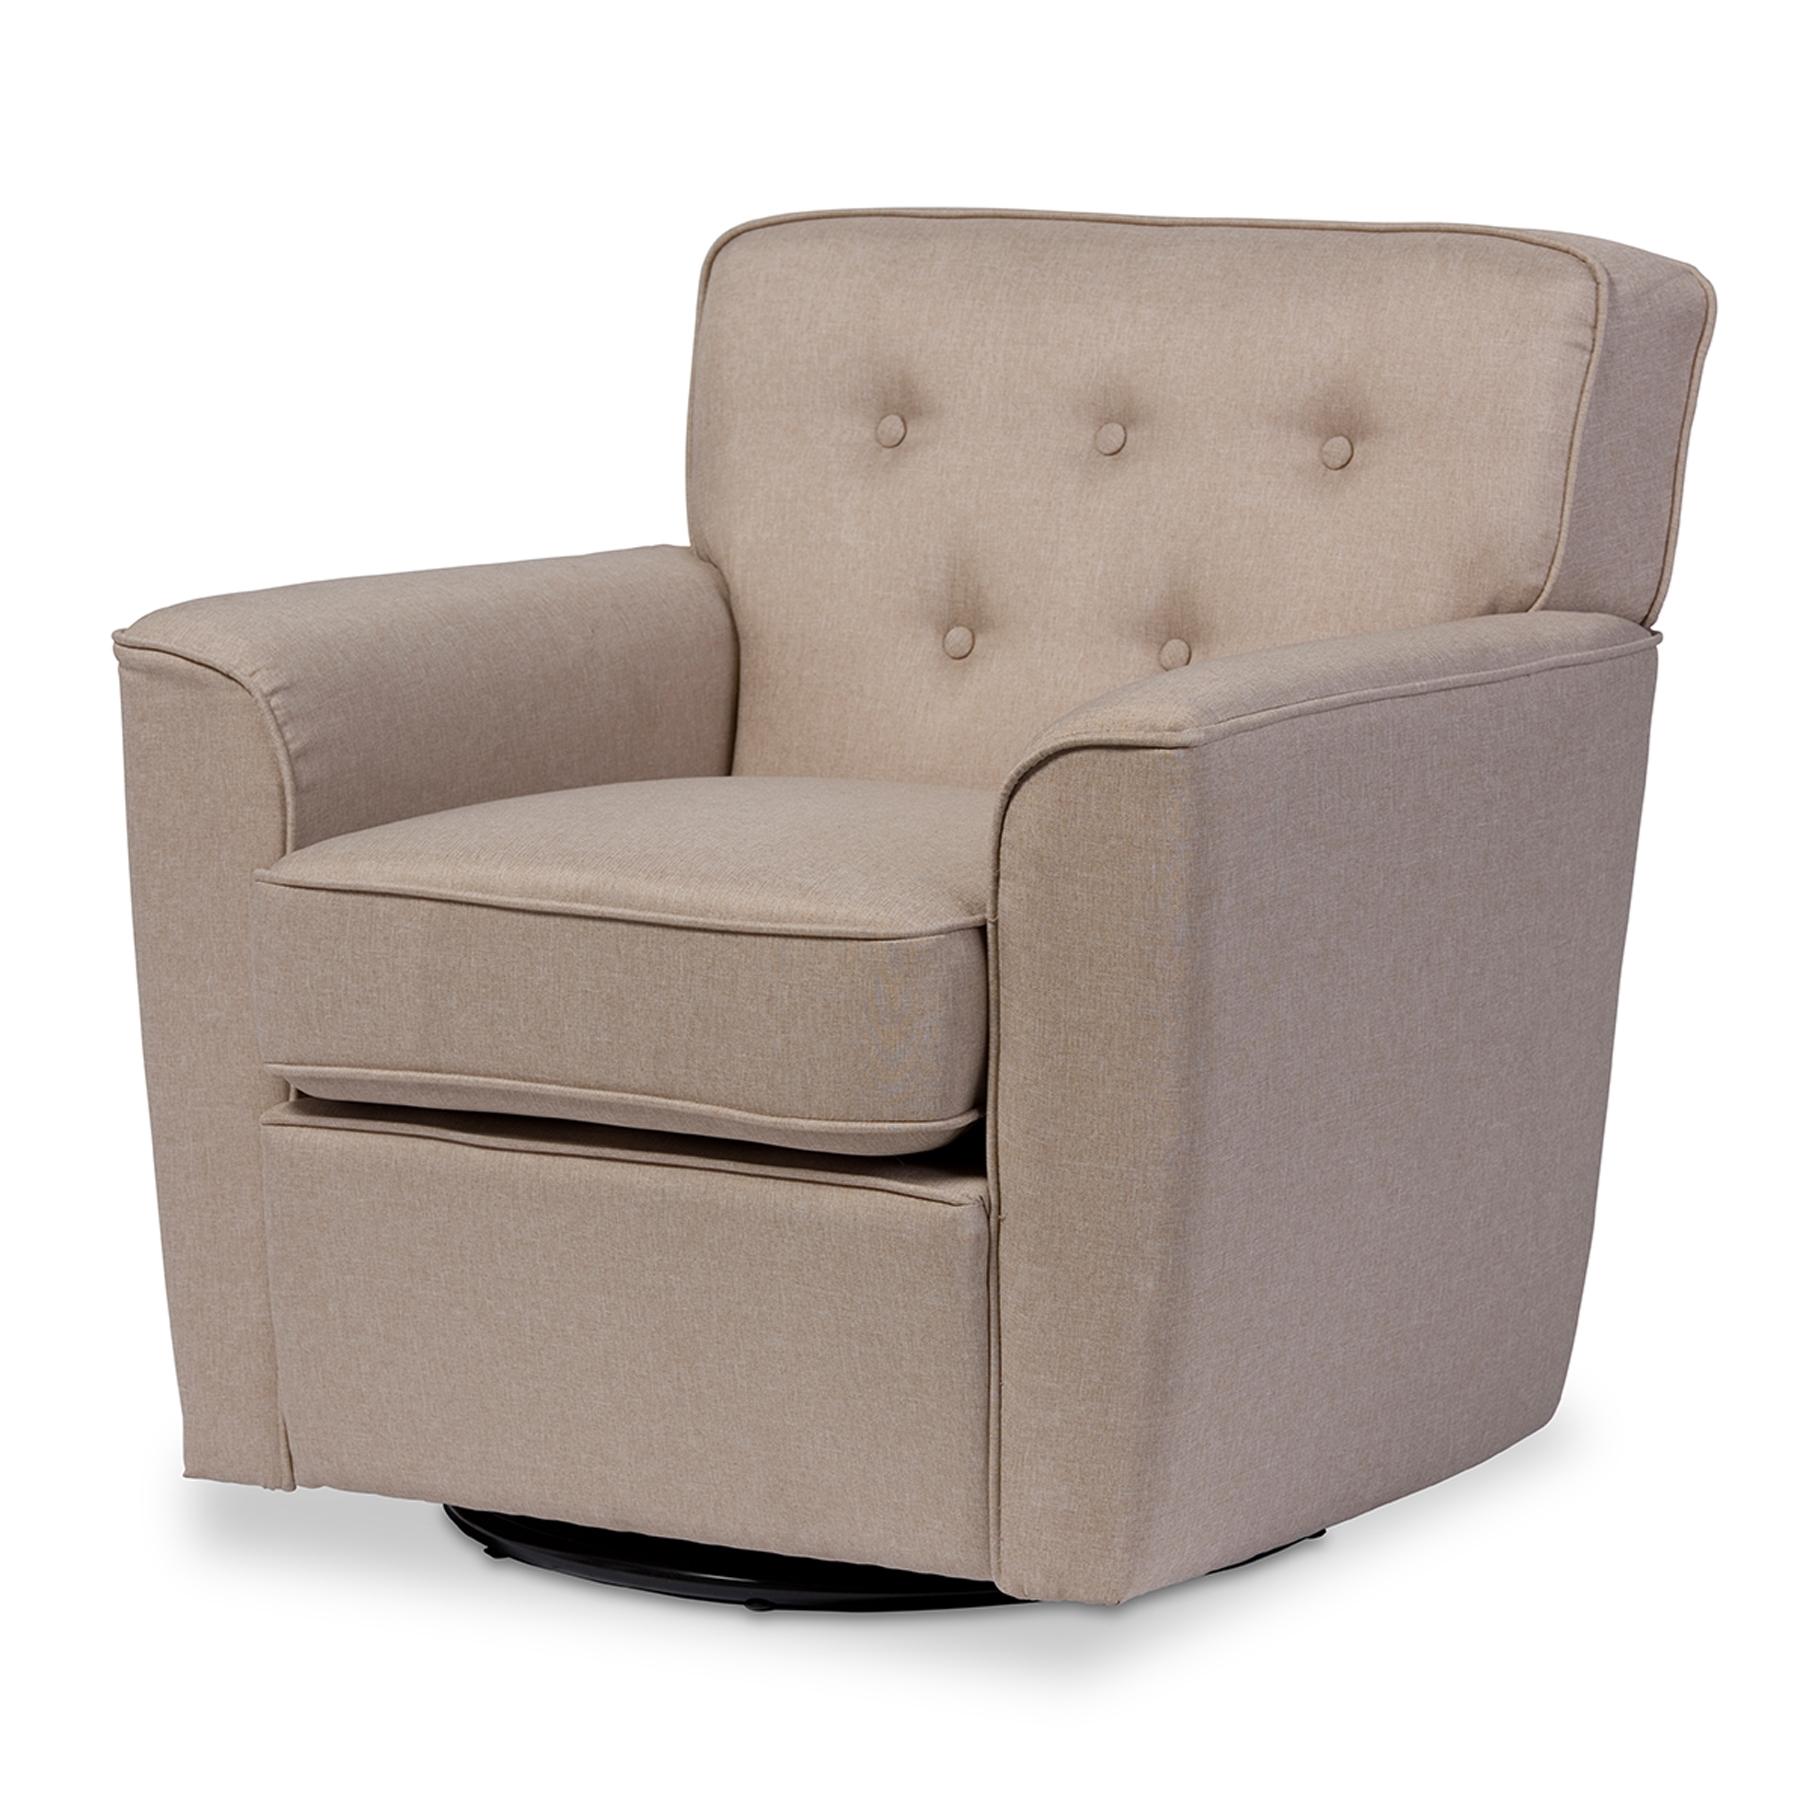 swivel chair national bookstore grosfillex plastic chairs baxton studio canberra modern retro contemporary beige